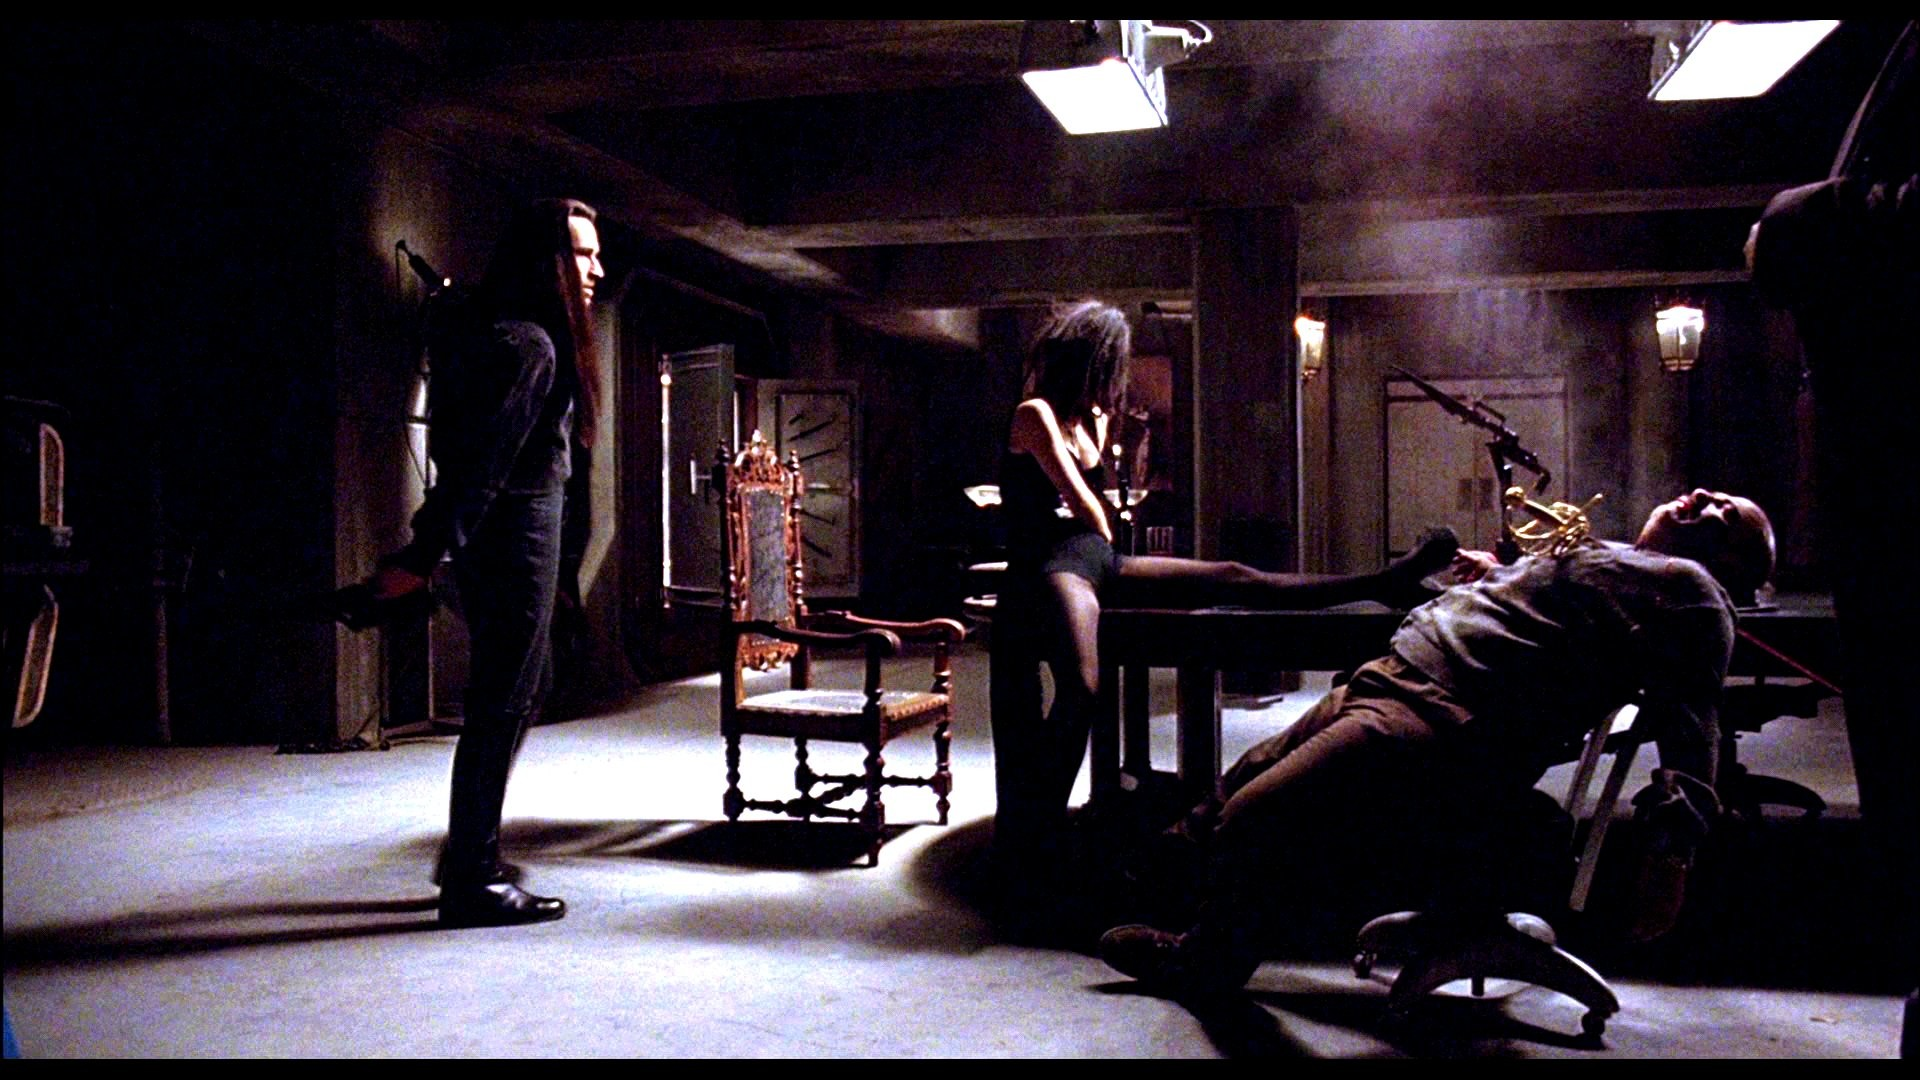 THE-CROW action fantasy dark gothic brandon lee crow (5) wallpaper      252437   WallpaperUP